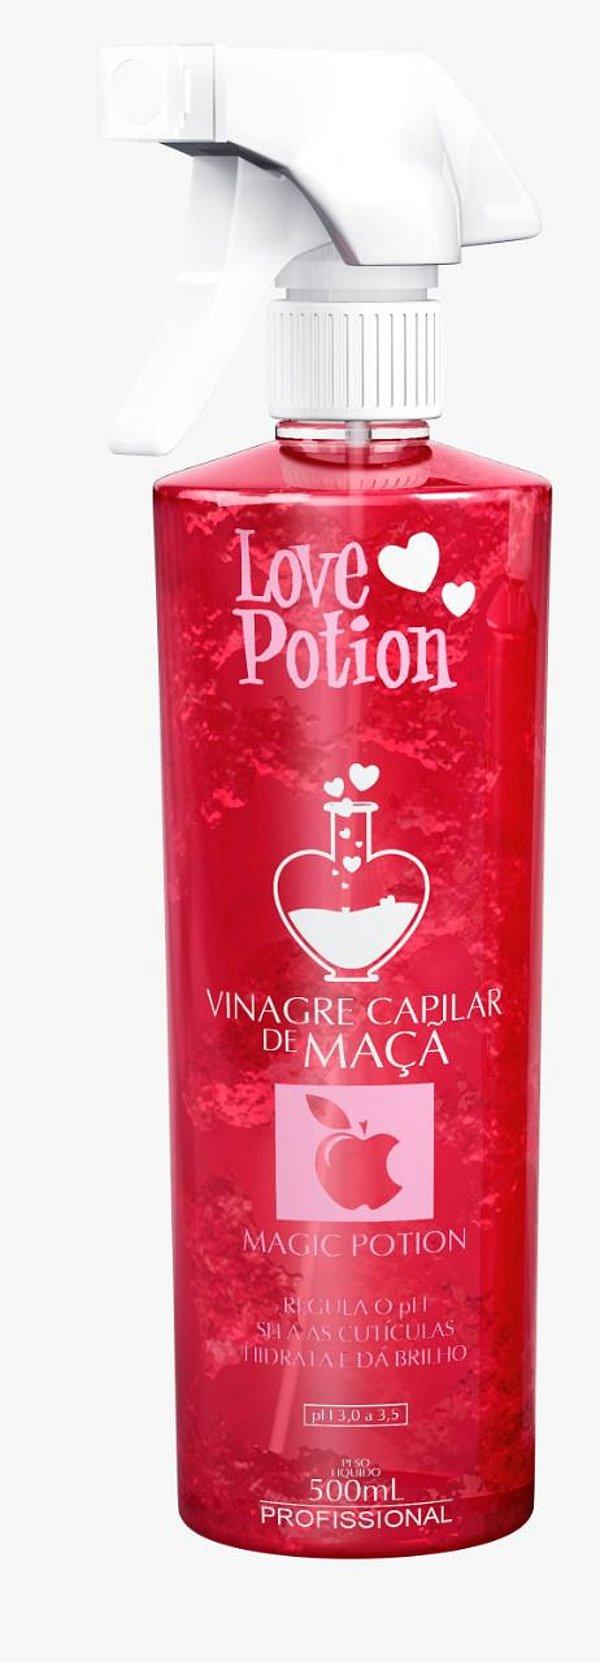 VINAGRE CAPILAR DE MAÇA 500ml - LOVE POTION